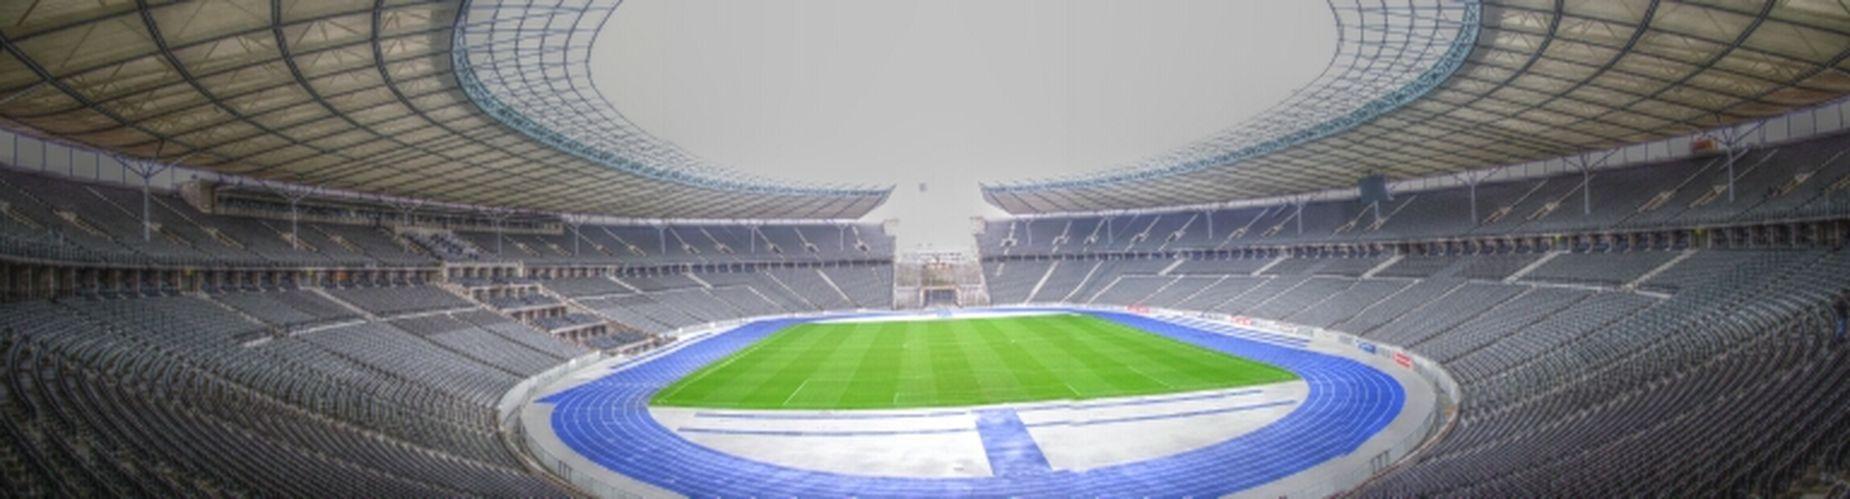 Oly-Pano 2k13 Architecture Berlin Historical Building Panorama Football Stadium Football Stadium Olympic Stadium Historical Sights Charlottenburg